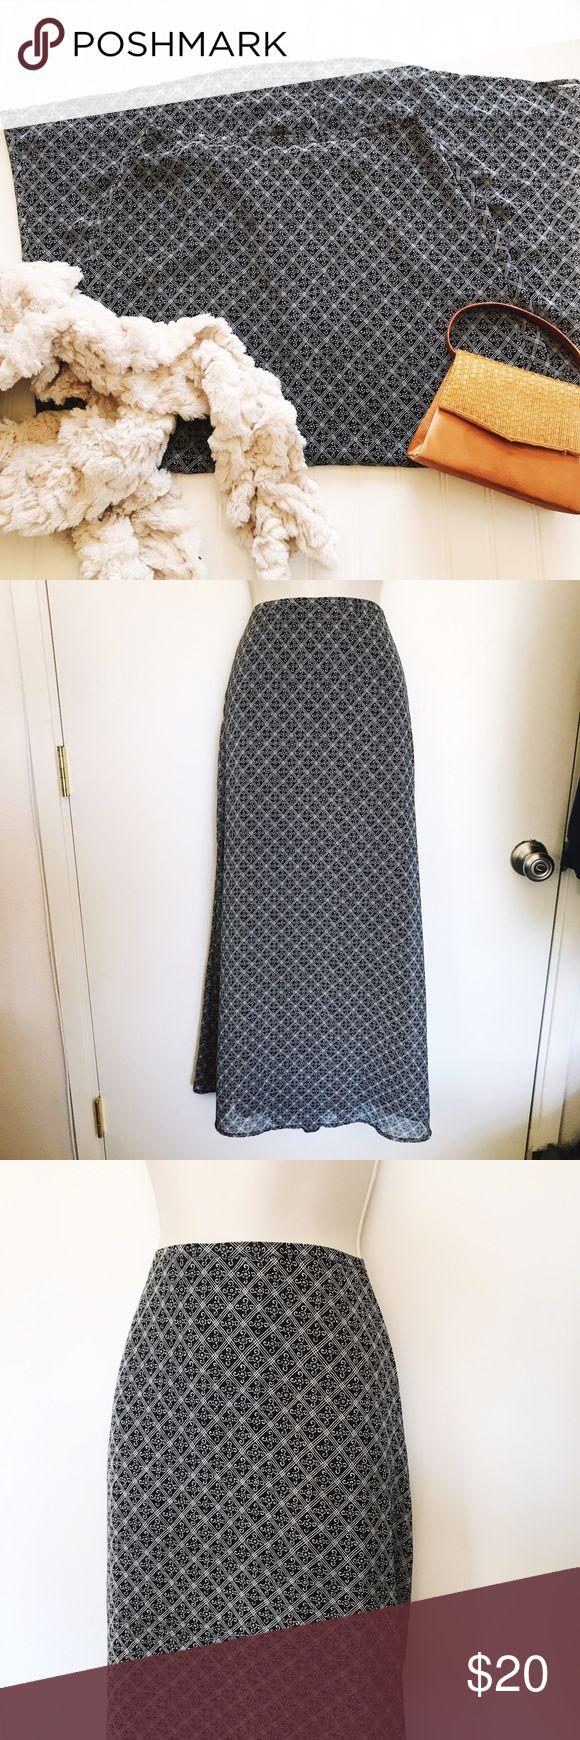 "Black And White Maxi Skirt Black And White Maxi Skirt  Feels like 100% Polyester   Waist 30"" Length 37"" Skirts Maxi"